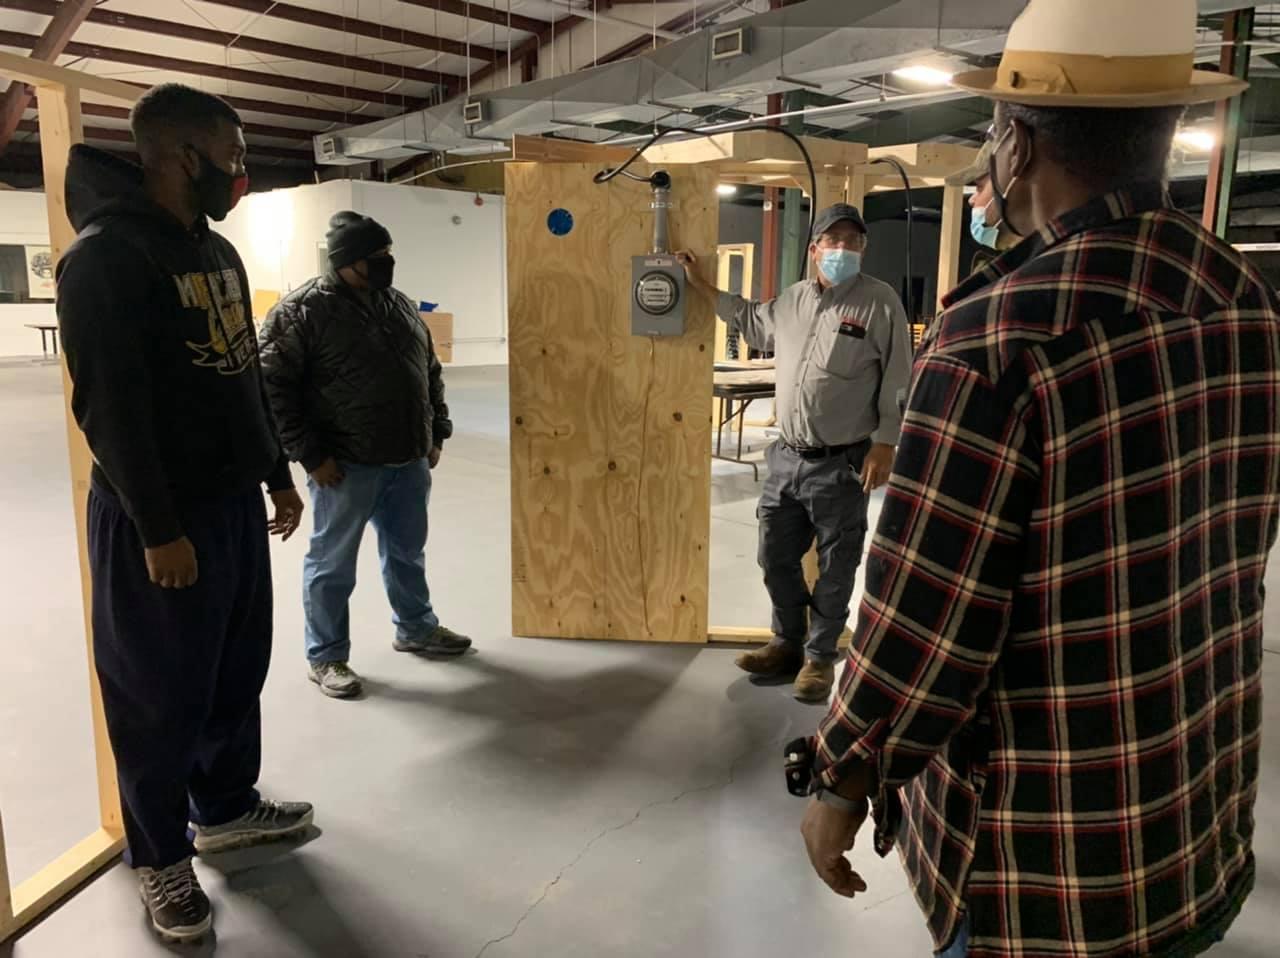 electrical wiring job training